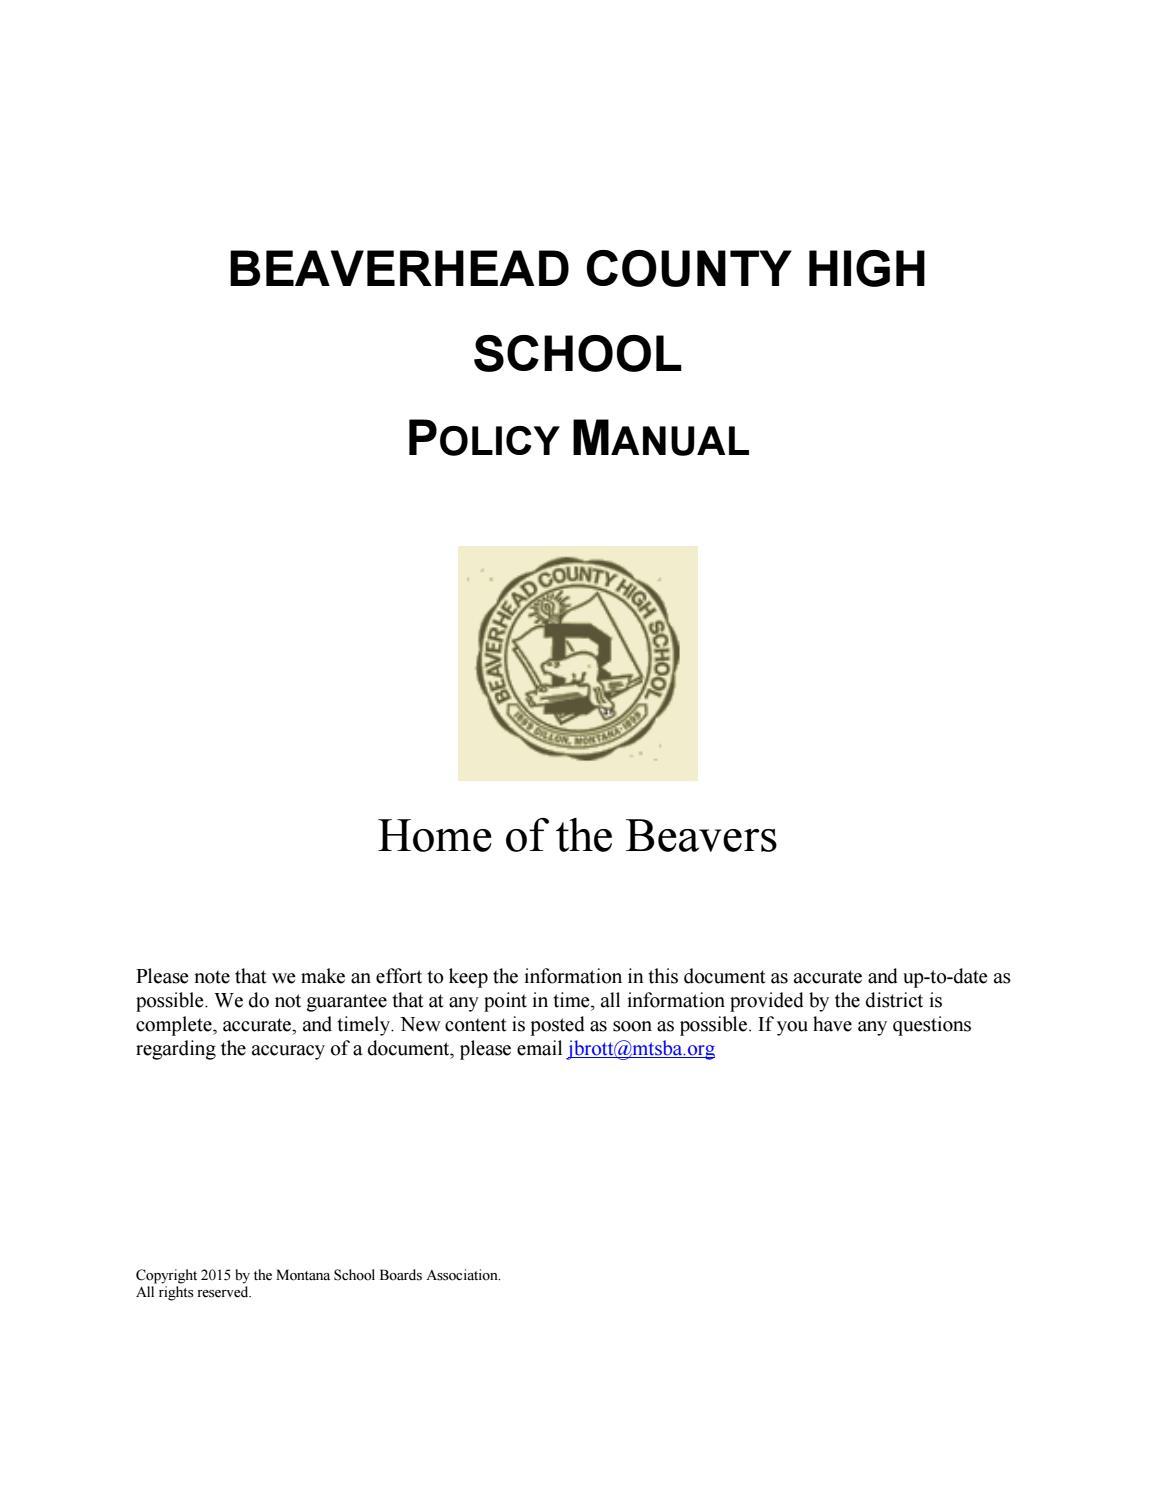 Beaverhead County High Policy Manual By Montana School Boards Fotos Recomended Stun Gun Circuit Diagram Association Issuu